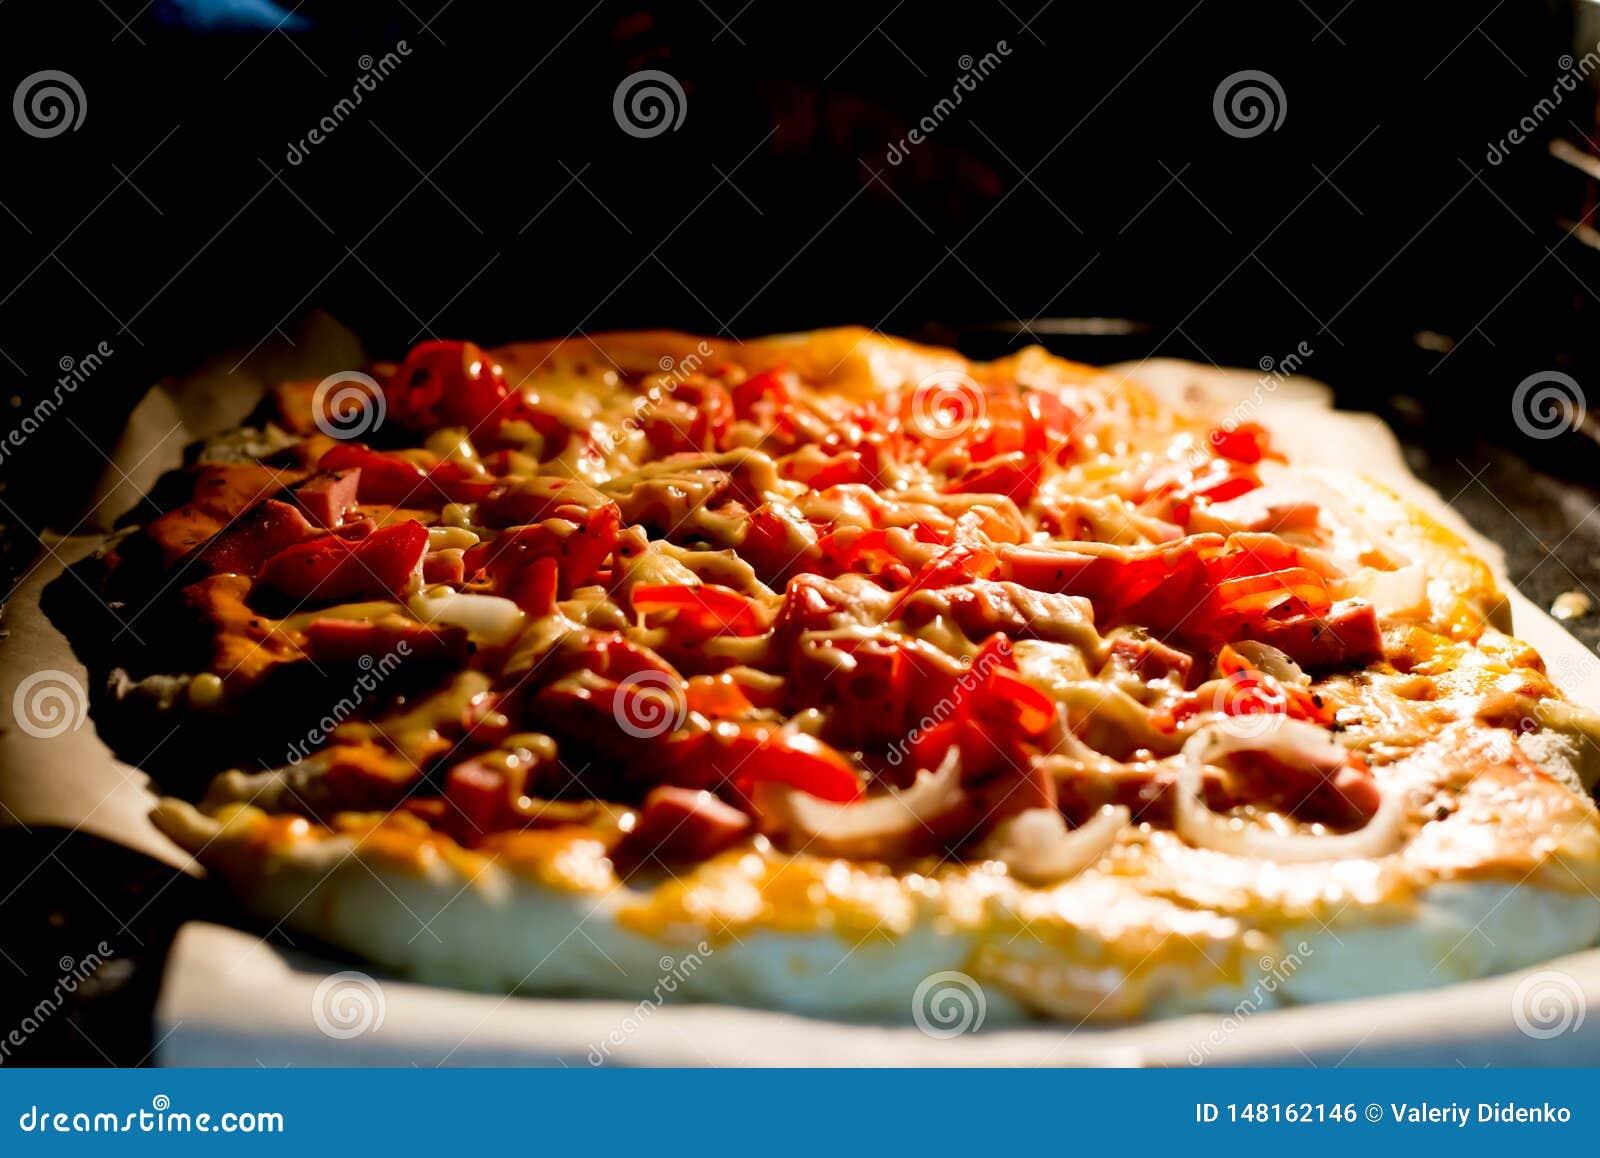 Prepare la pizza por primera vez